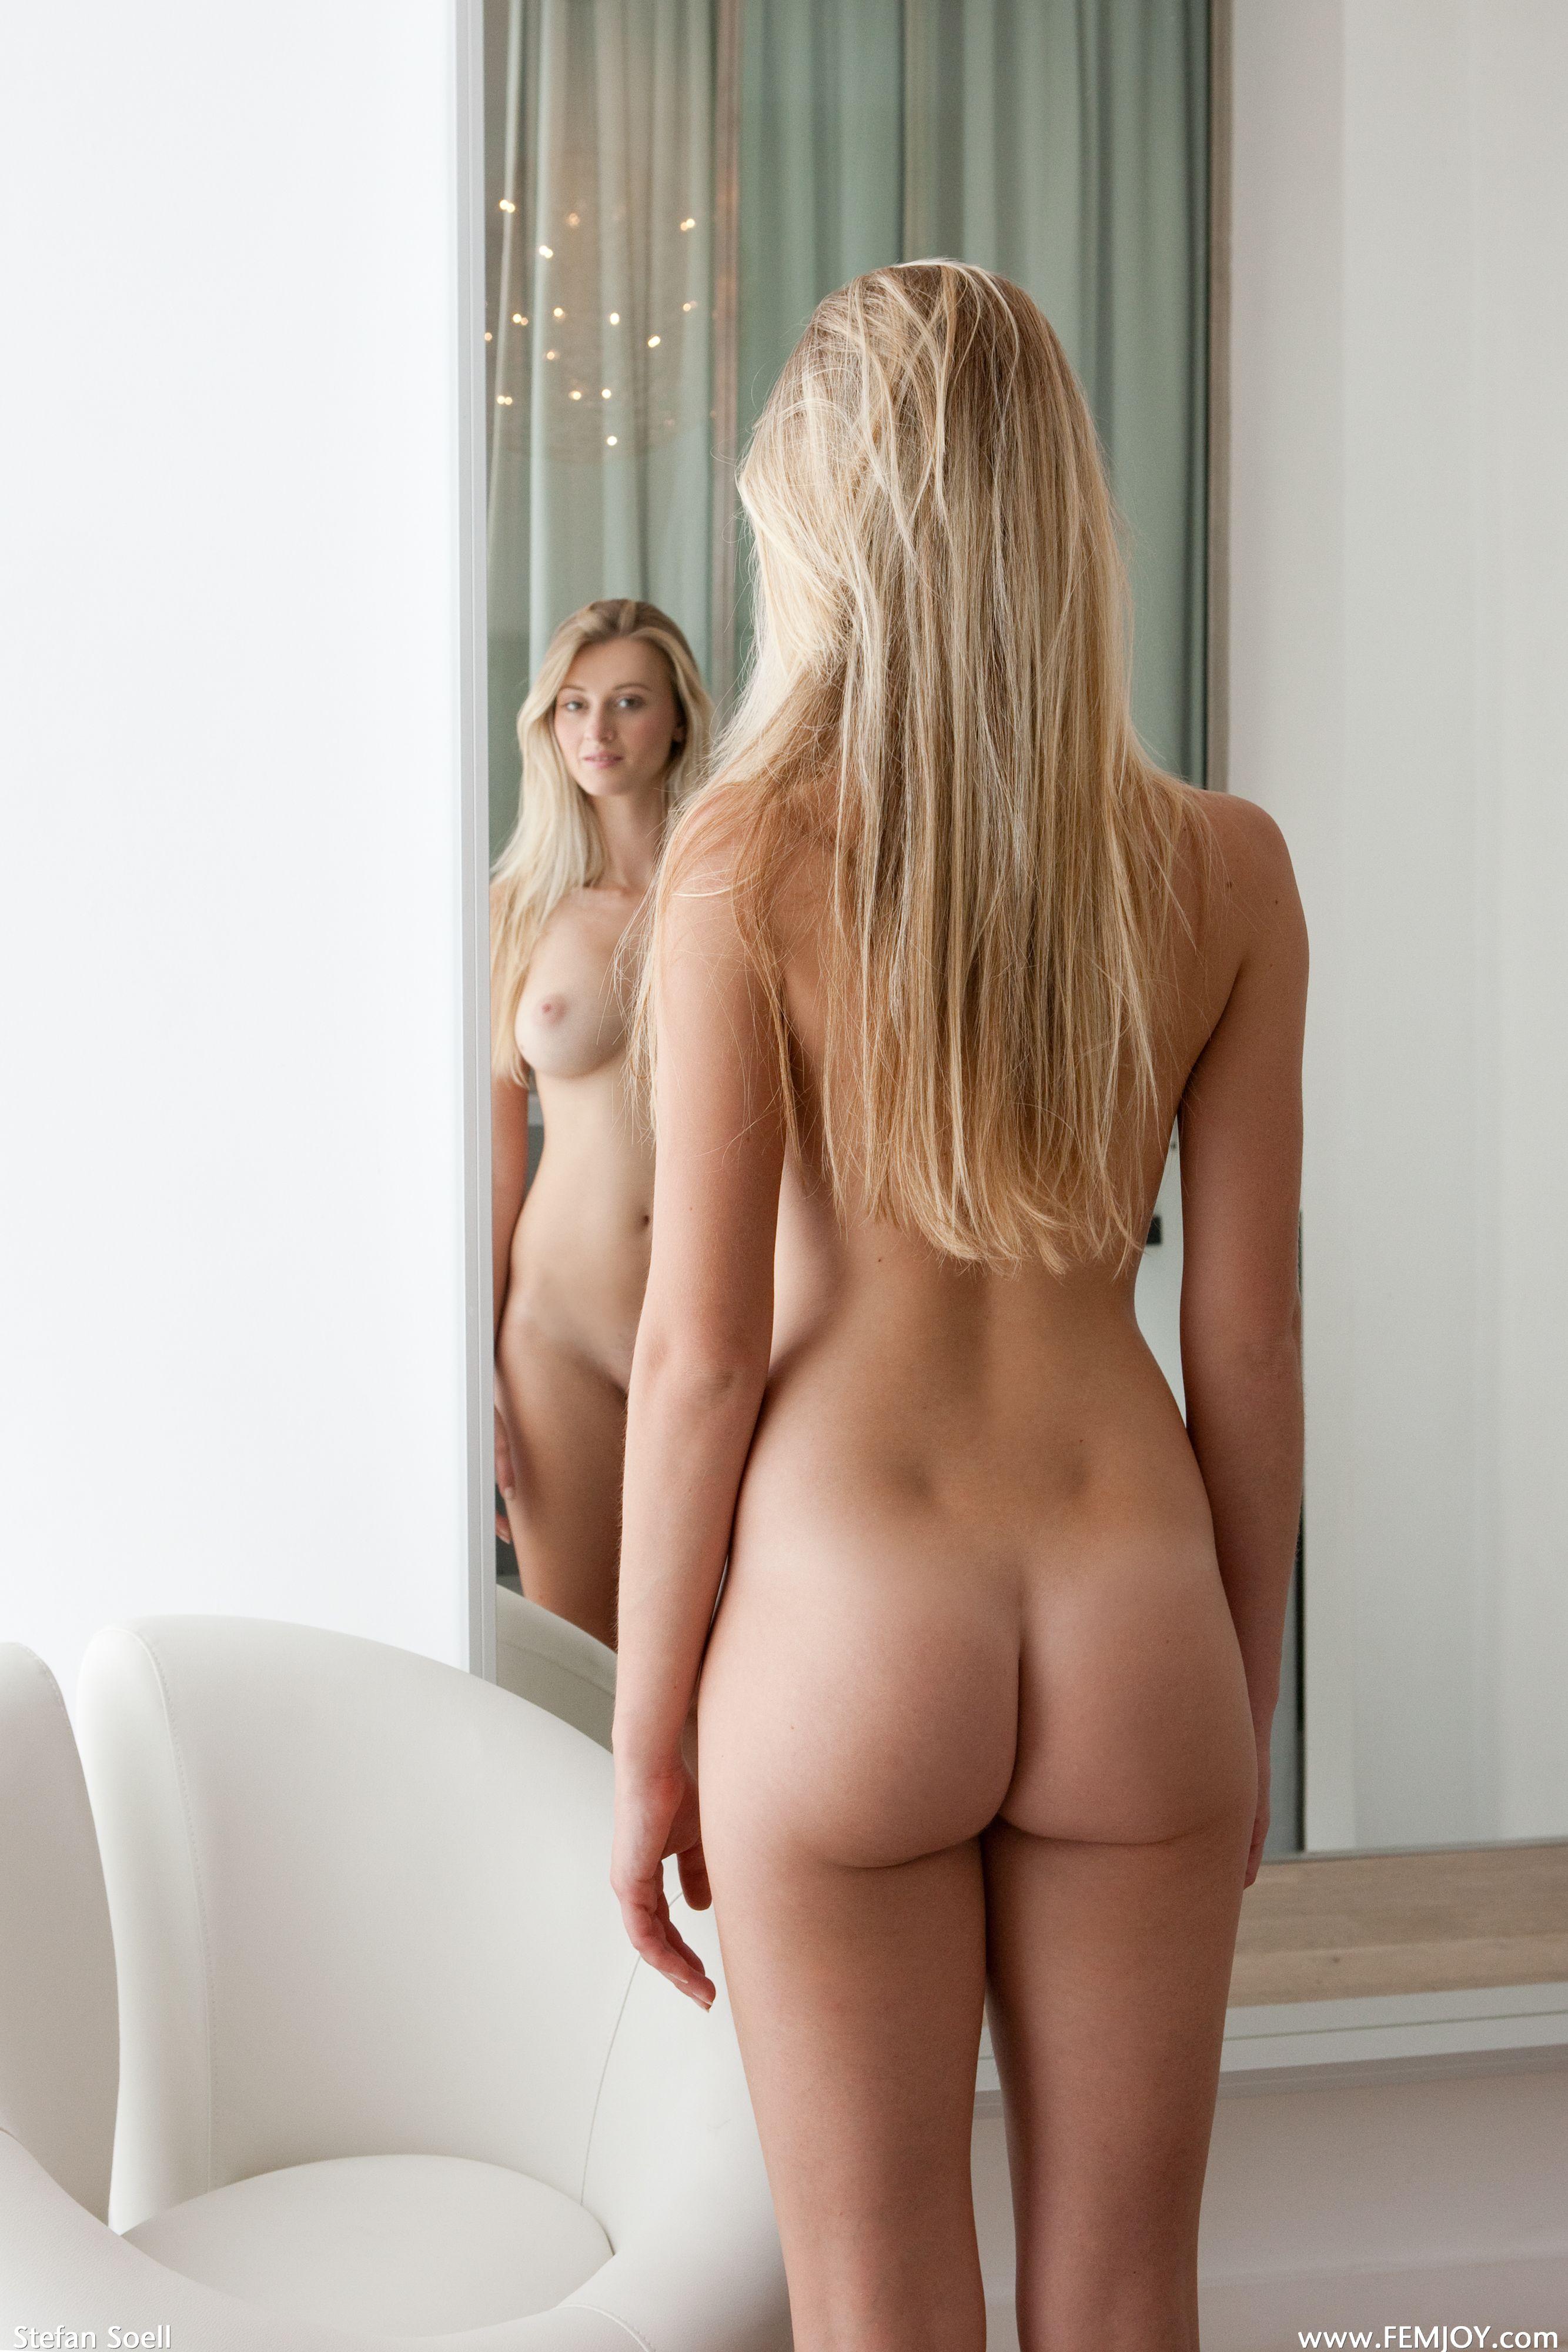 Carisha femjoy nude model good